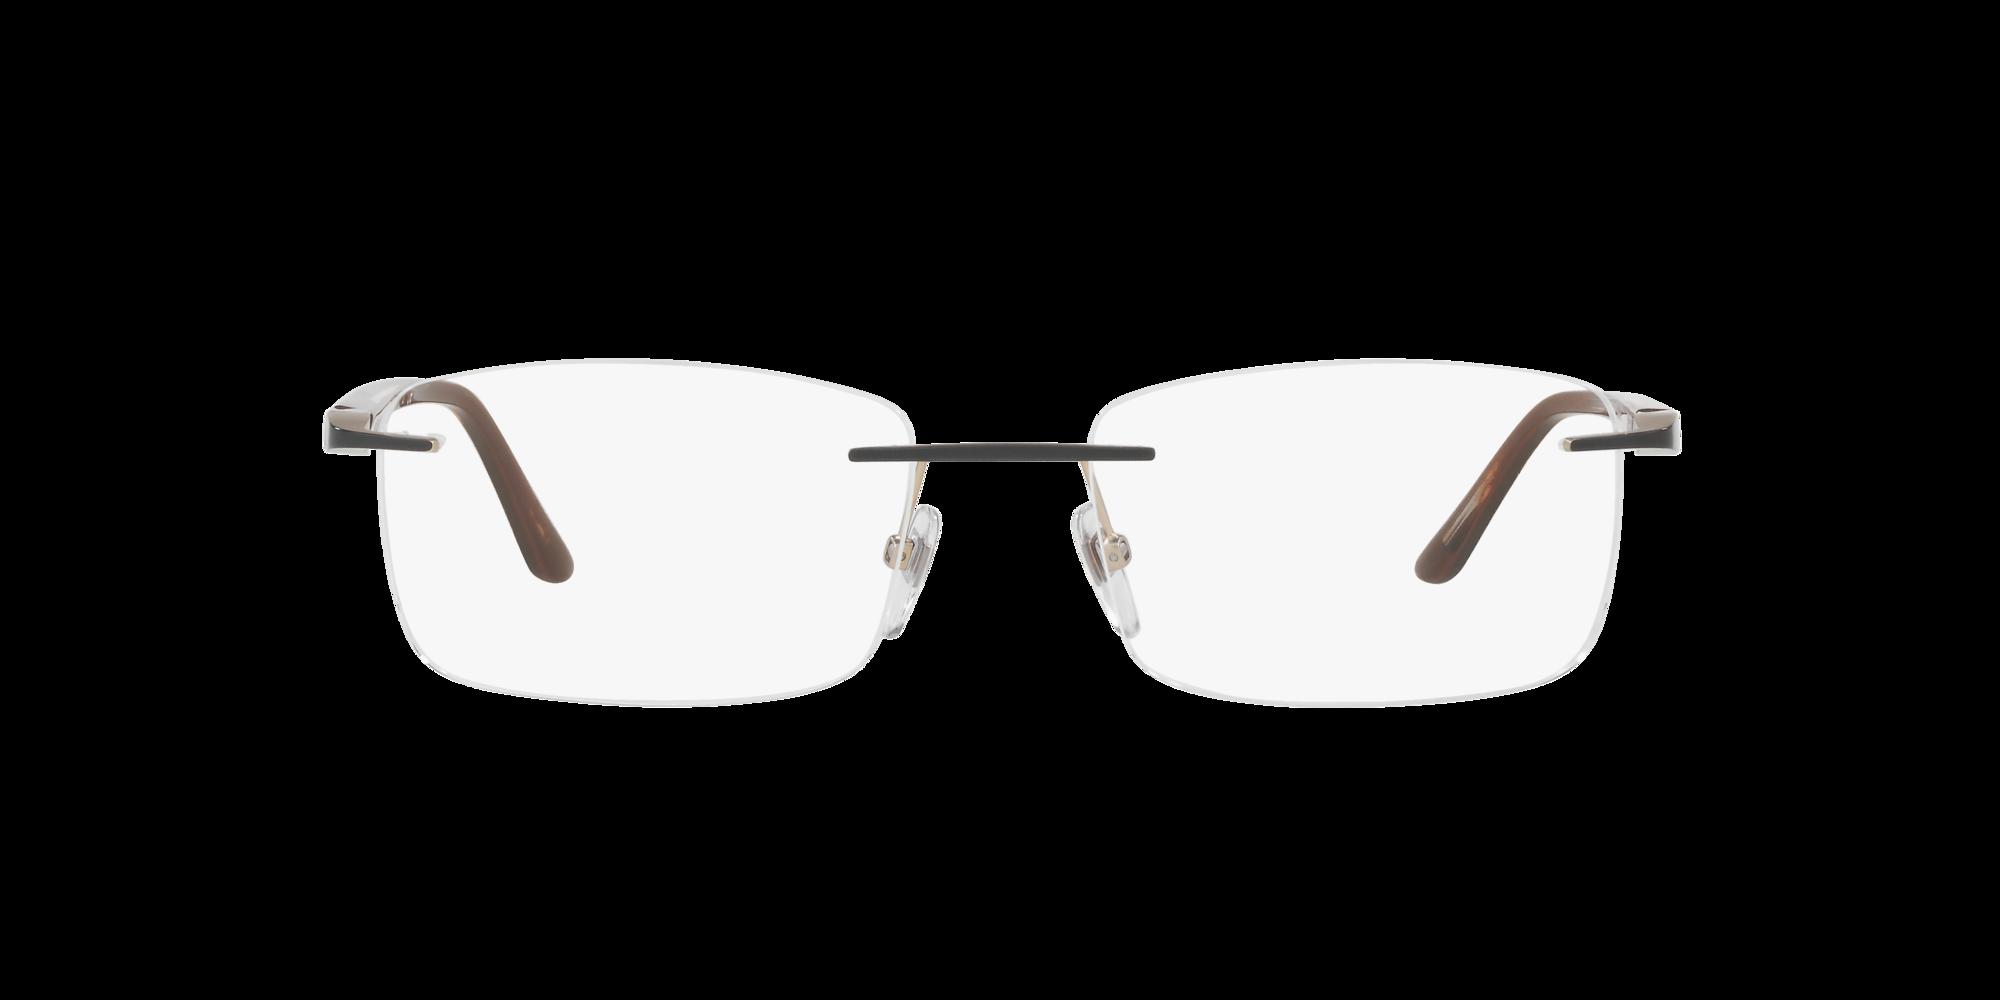 Image for SH2023 from LensCrafters   Glasses, Prescription Glasses Online, Eyewear